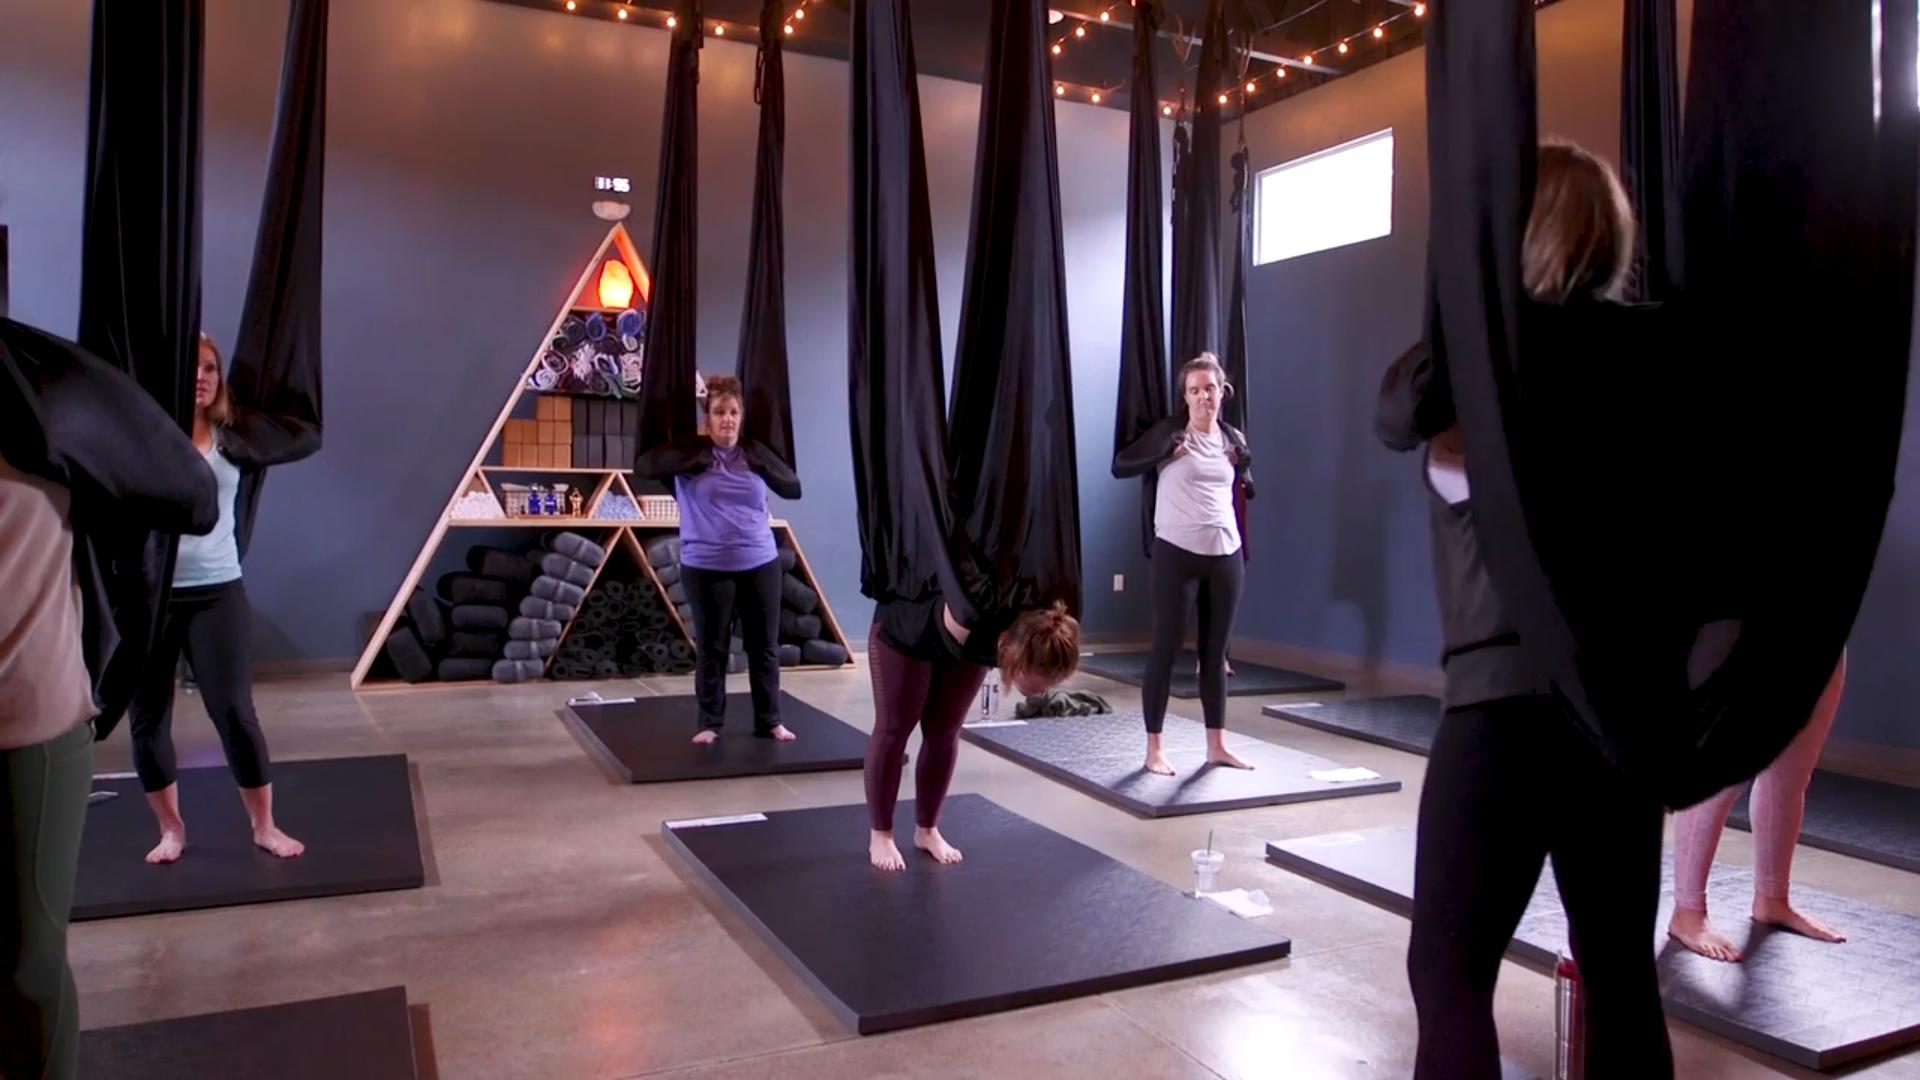 $20 - Aerial Yoga Drop-In